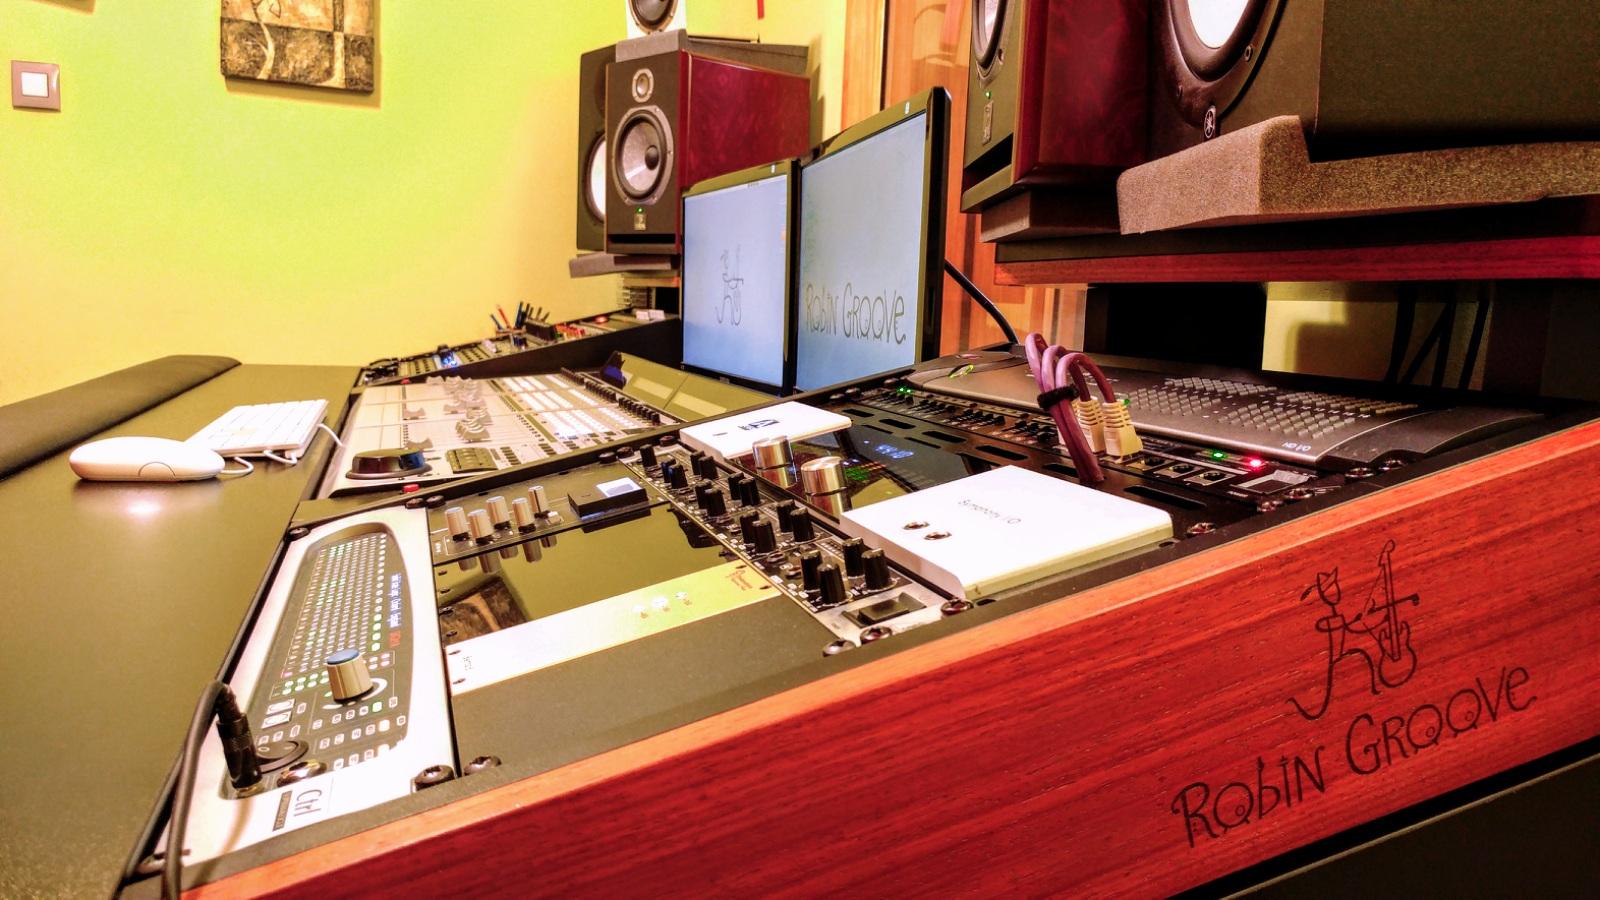 Robin Groove Estudio Grabación Mesa Previos